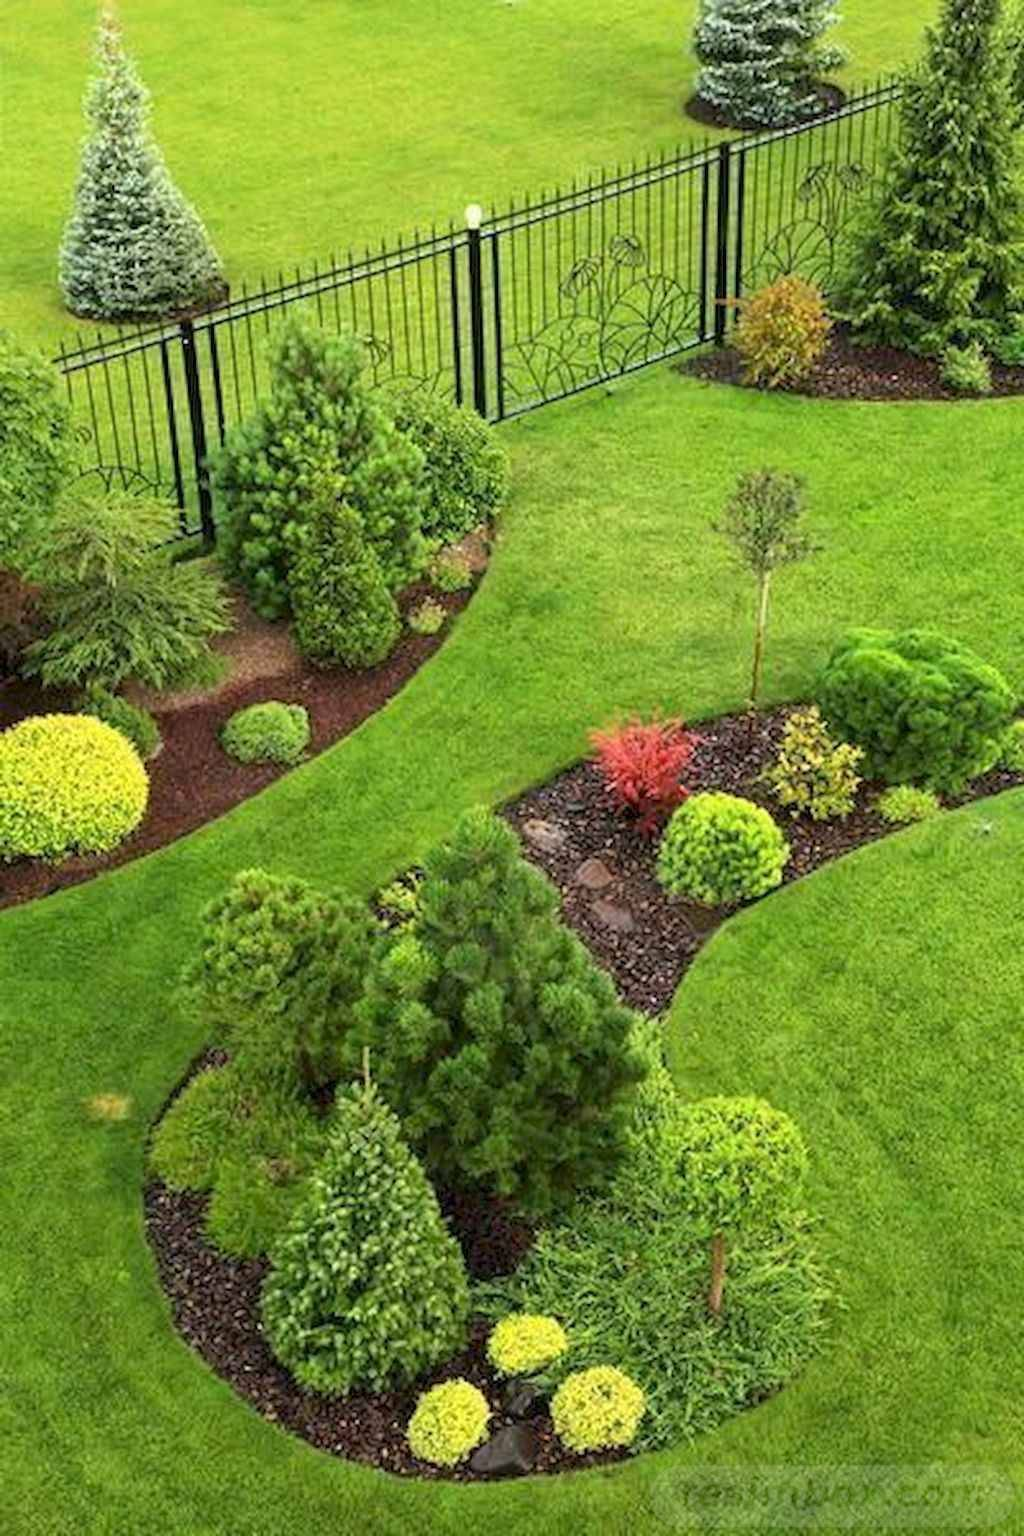 amazing garden ideas-757097387339564656